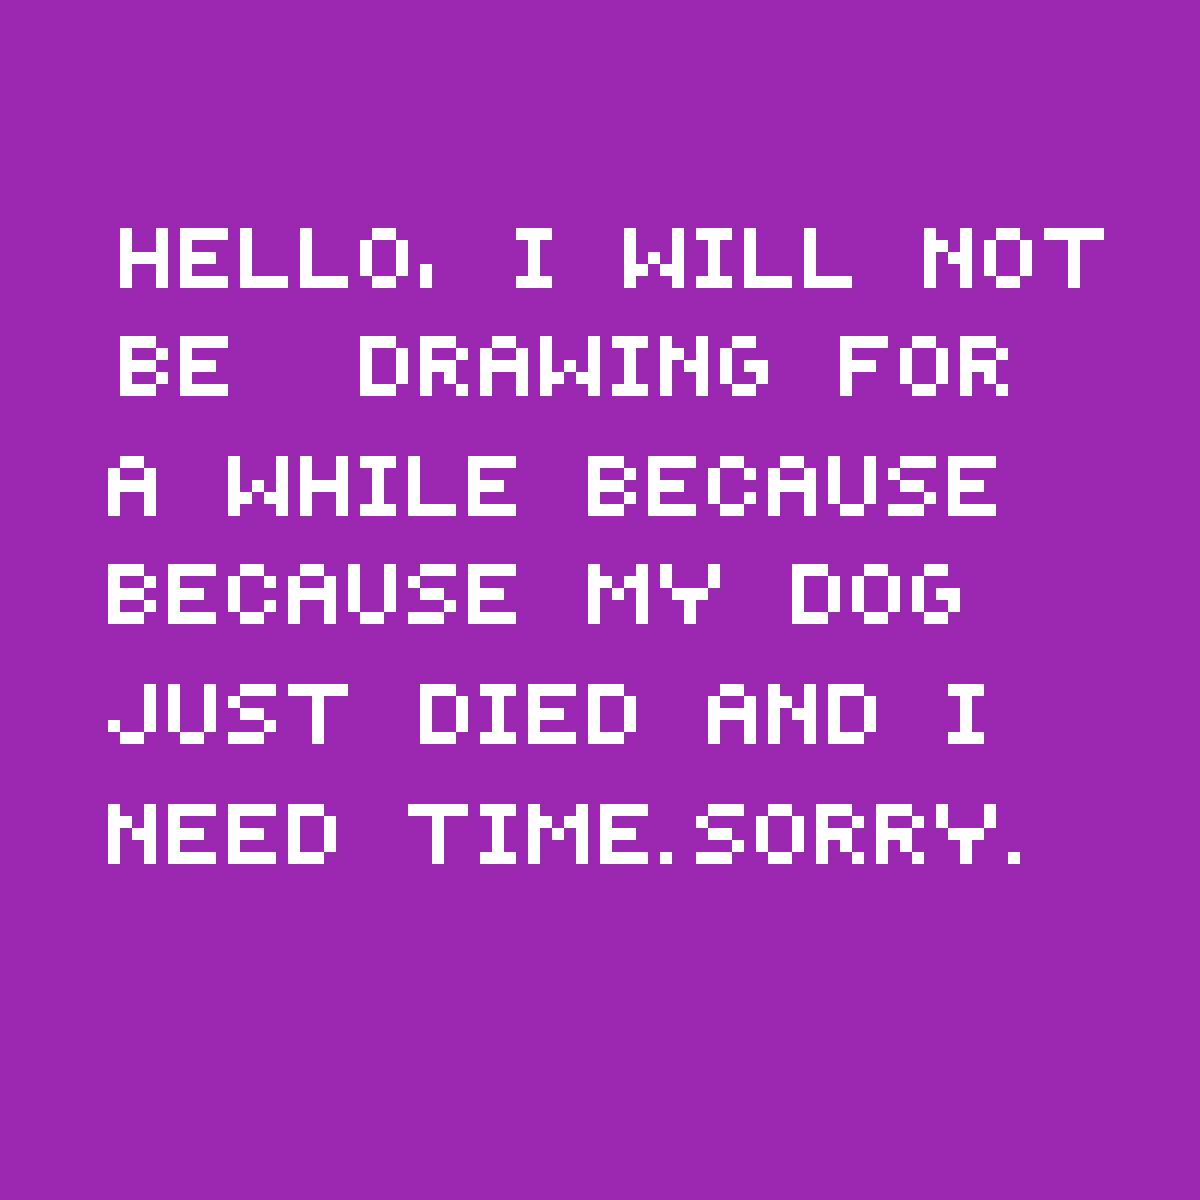 Im sorry by DreamyArtDemon